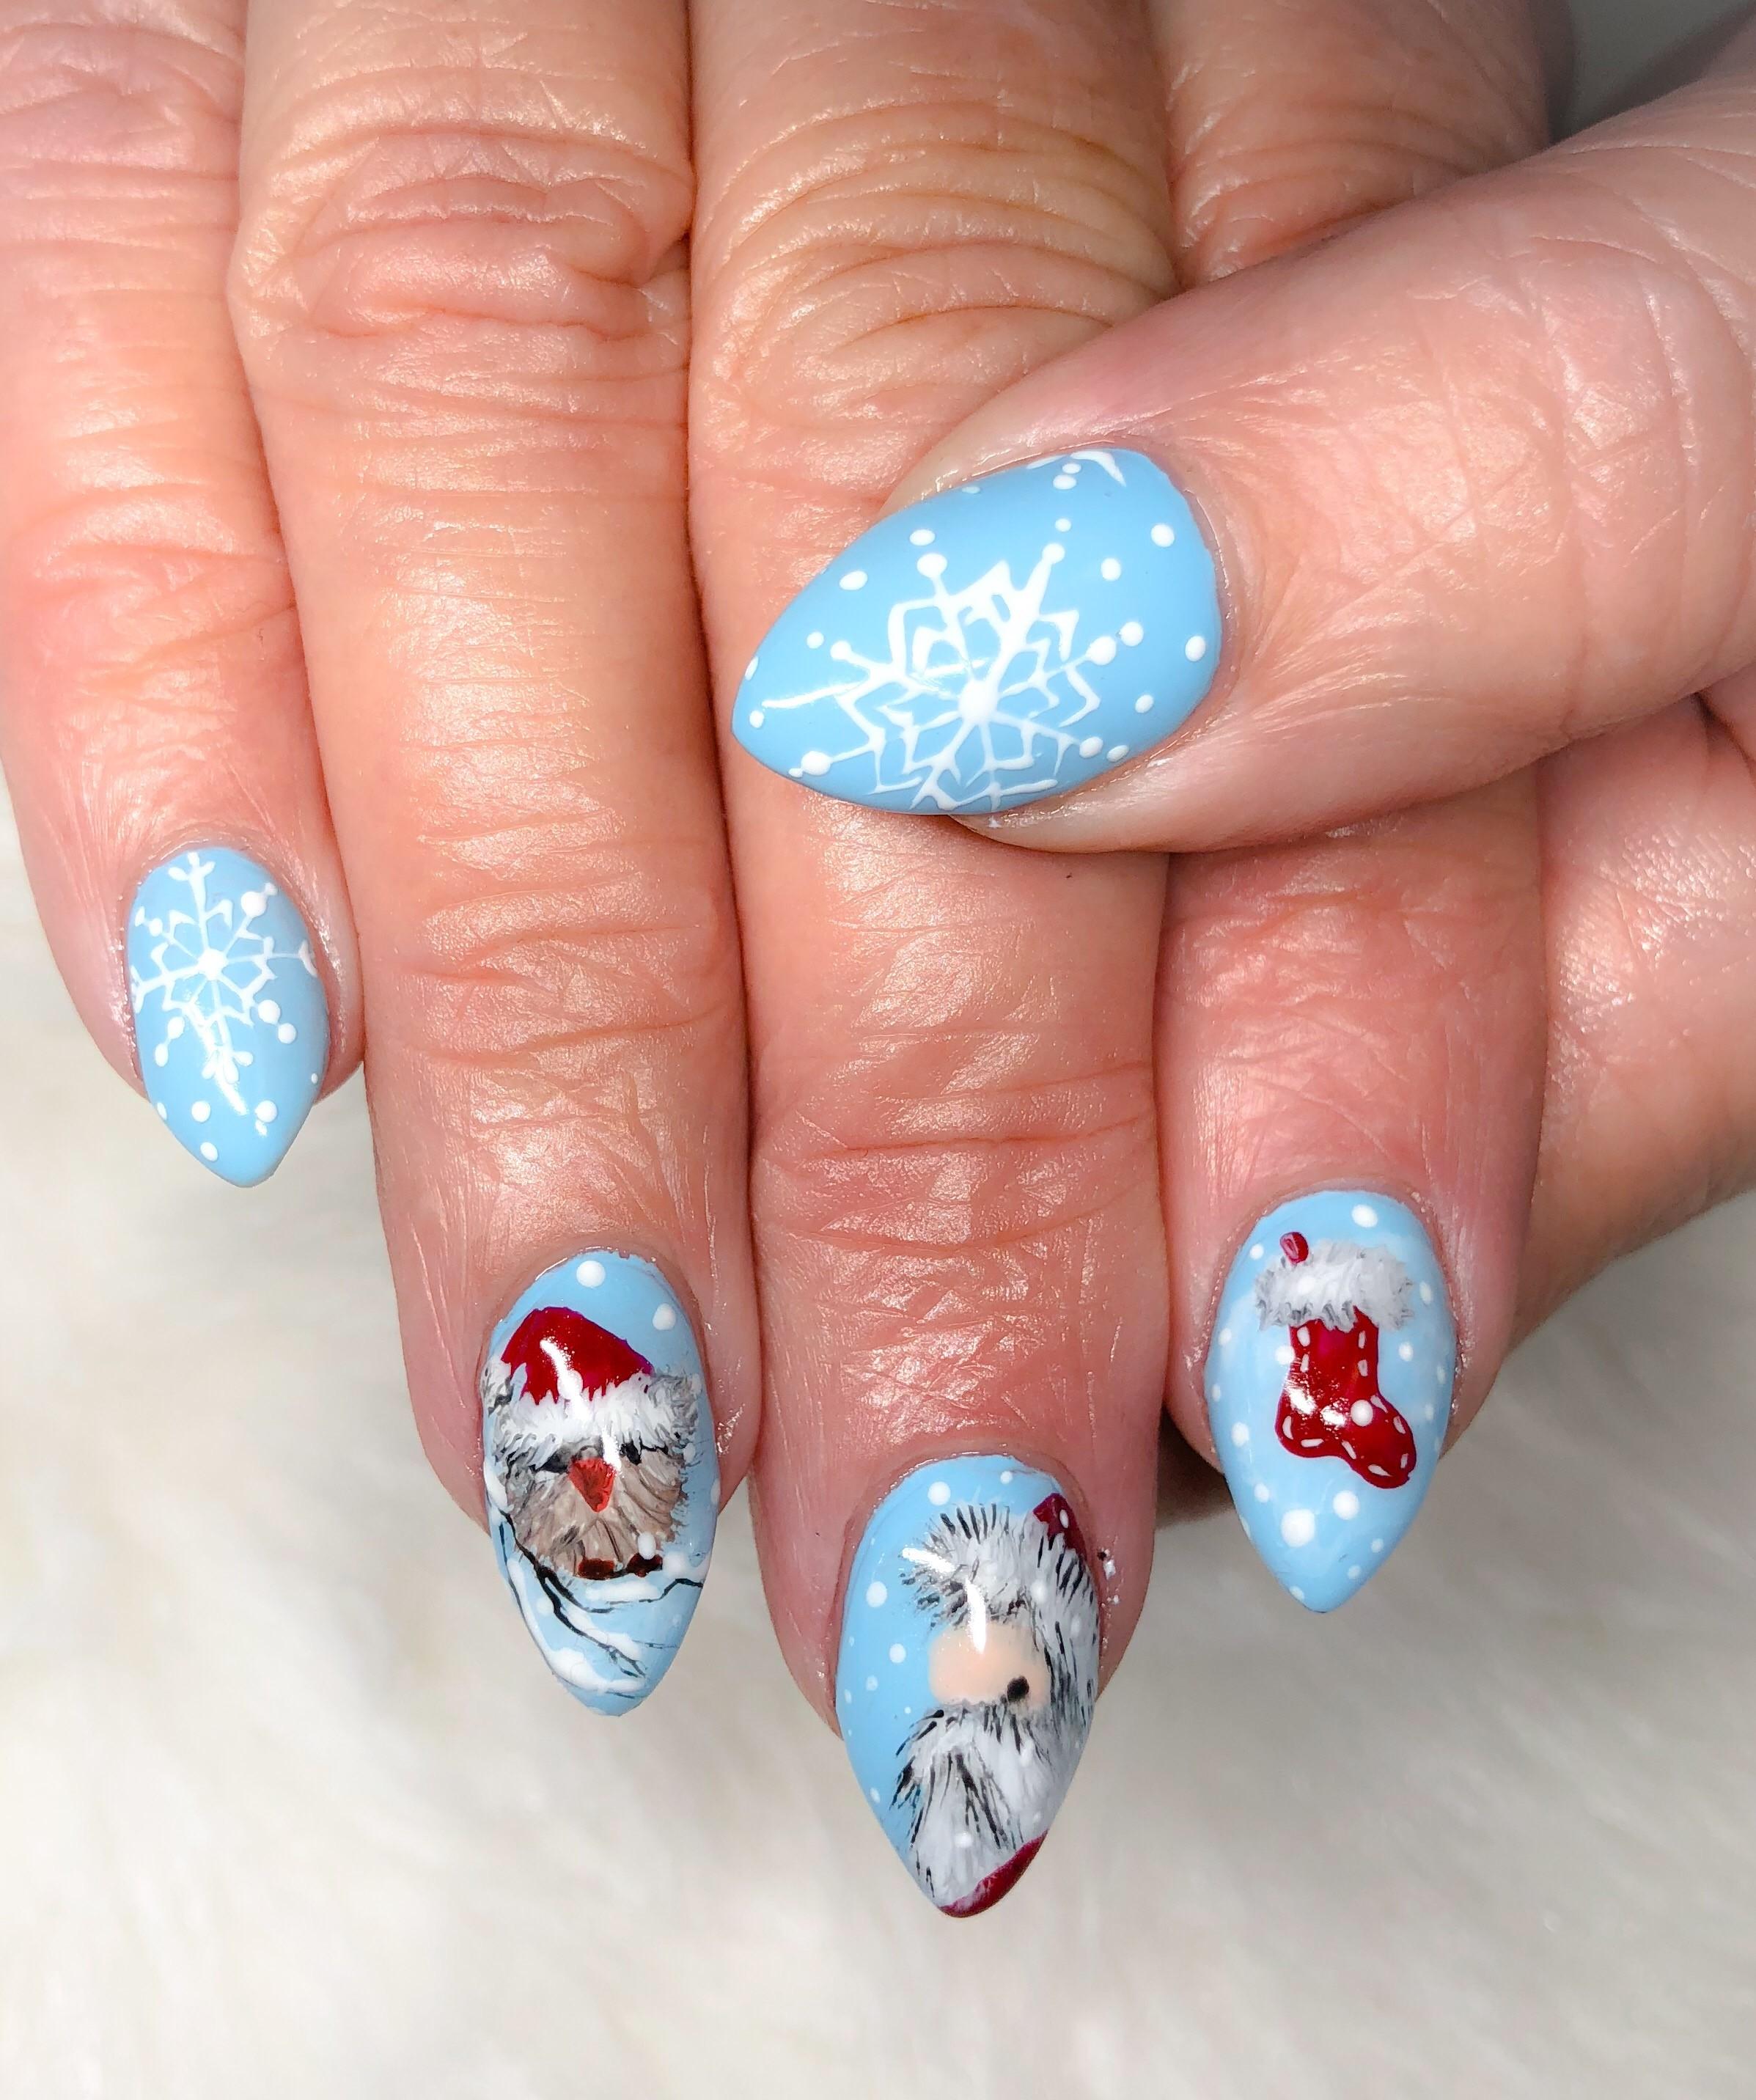 Day 340: Winter and Christmas Nail Art